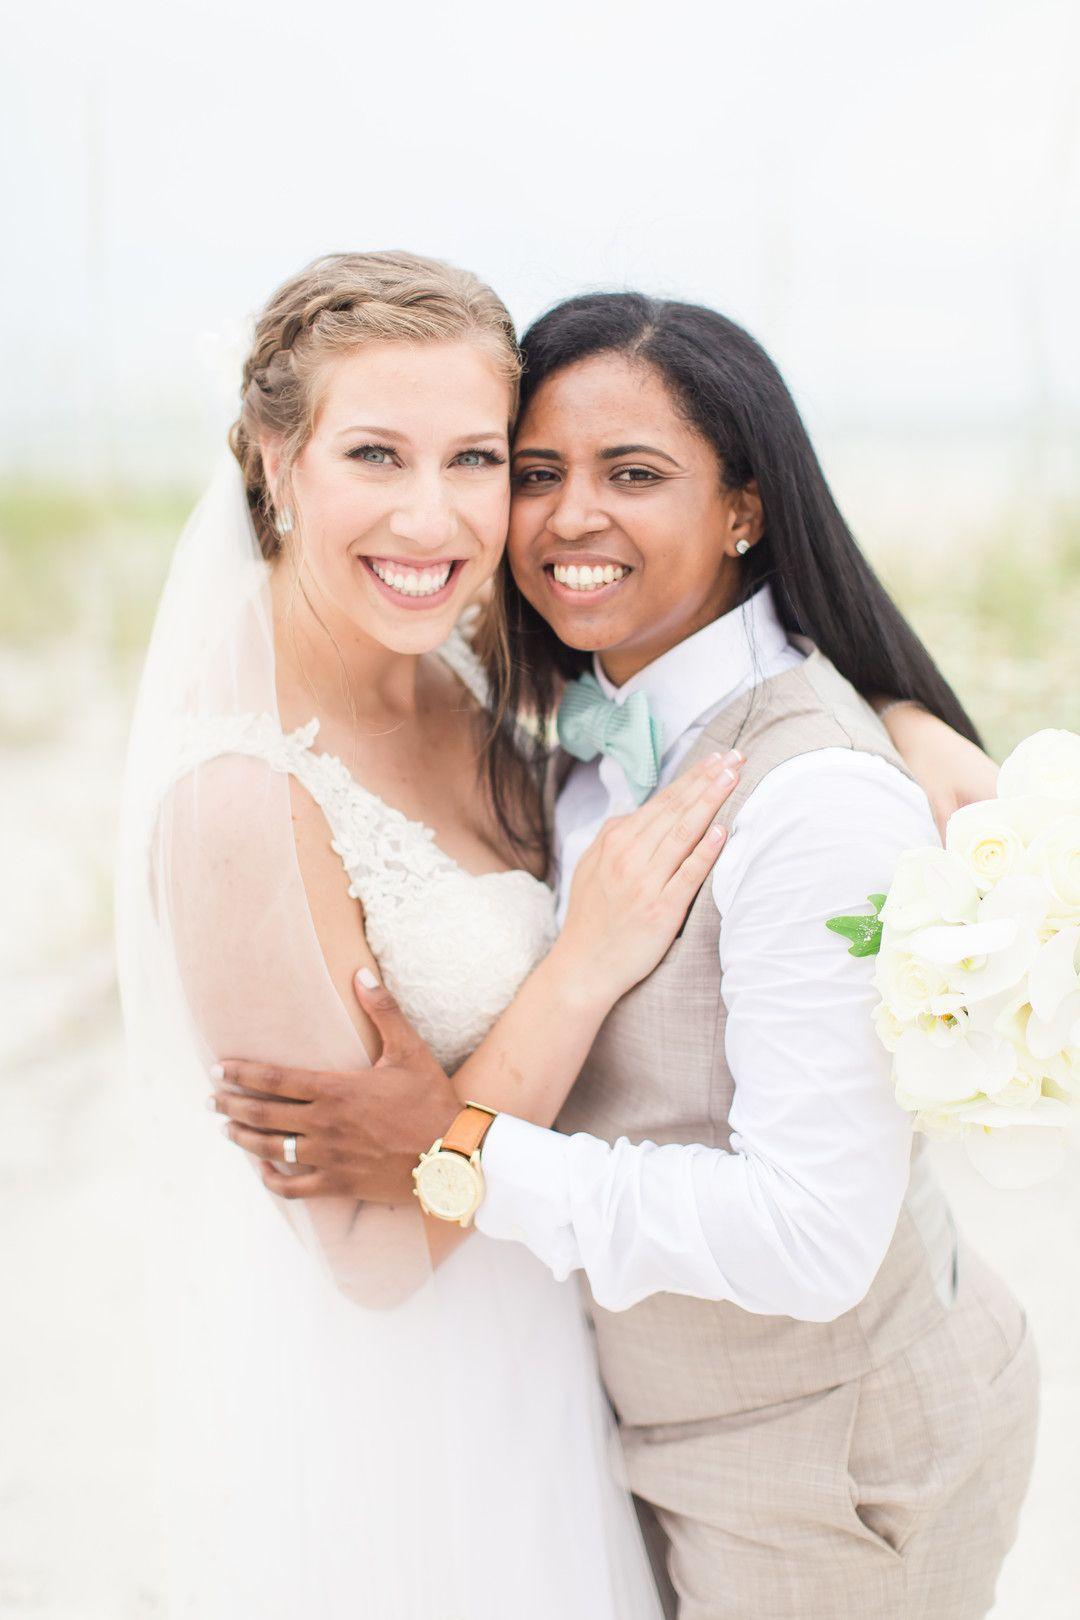 Tropical Blue And Green Beach Wedding In St Petersburg Florida Lesbian Wedding Wedding Gowns Vintage Wedding Film